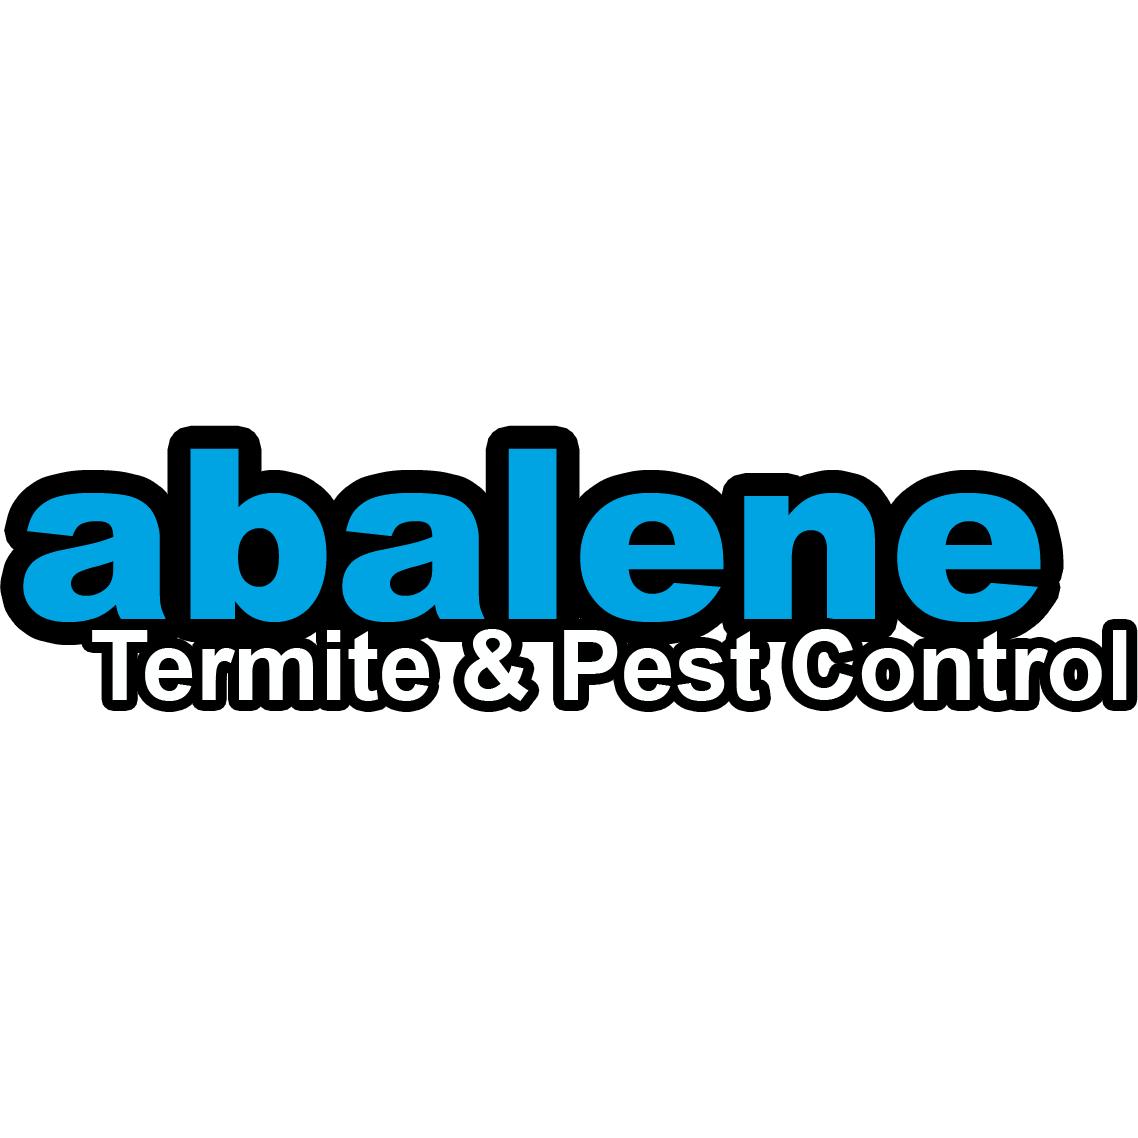 Abalene Termite & Pest Control image 0